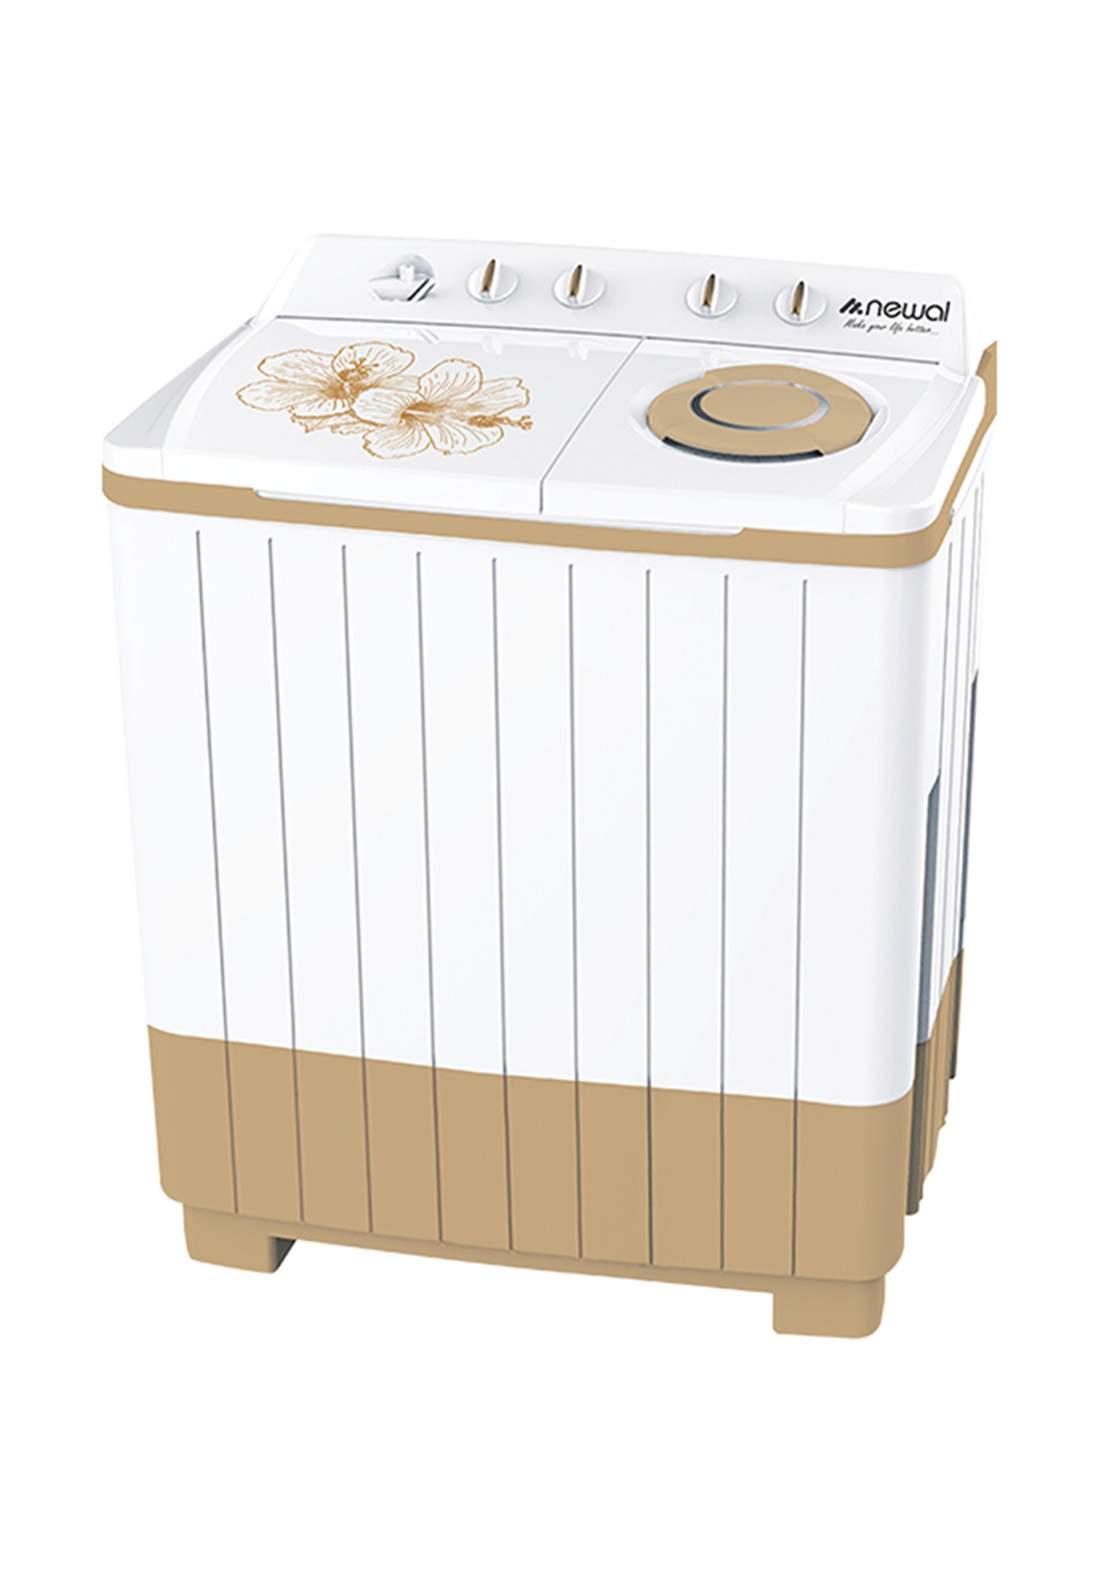 Newal WSH-6116-04 Twin Tub Washing Machine غسالة ملابس